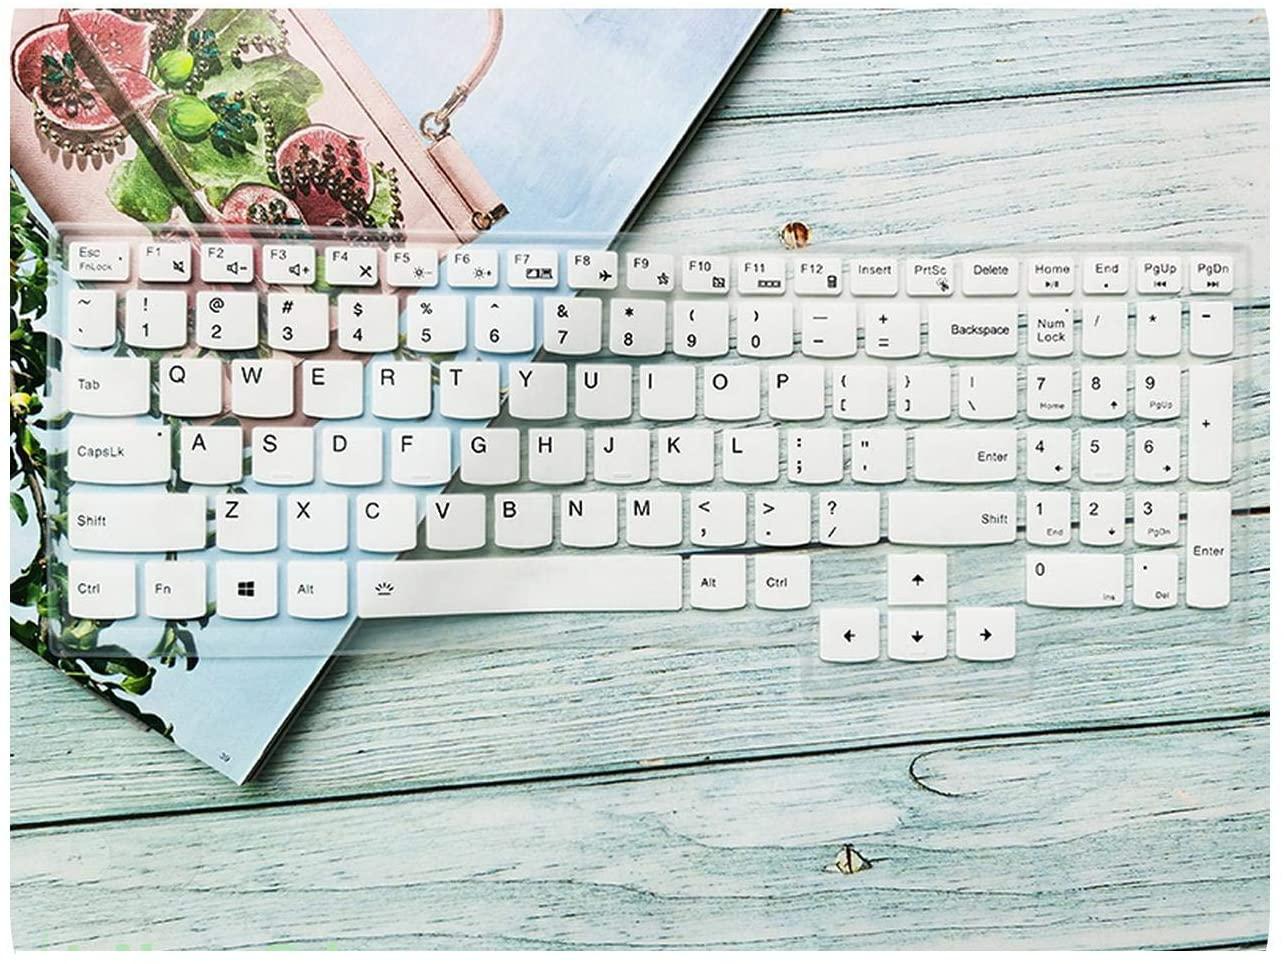 Silicone Keyboard Cover Skin for 15.6 Inch Lenovo Legion 5 15 2020 Y7000P R7000P R7000 Y7000 Legion5 Laptop Protector 15 inch-White-